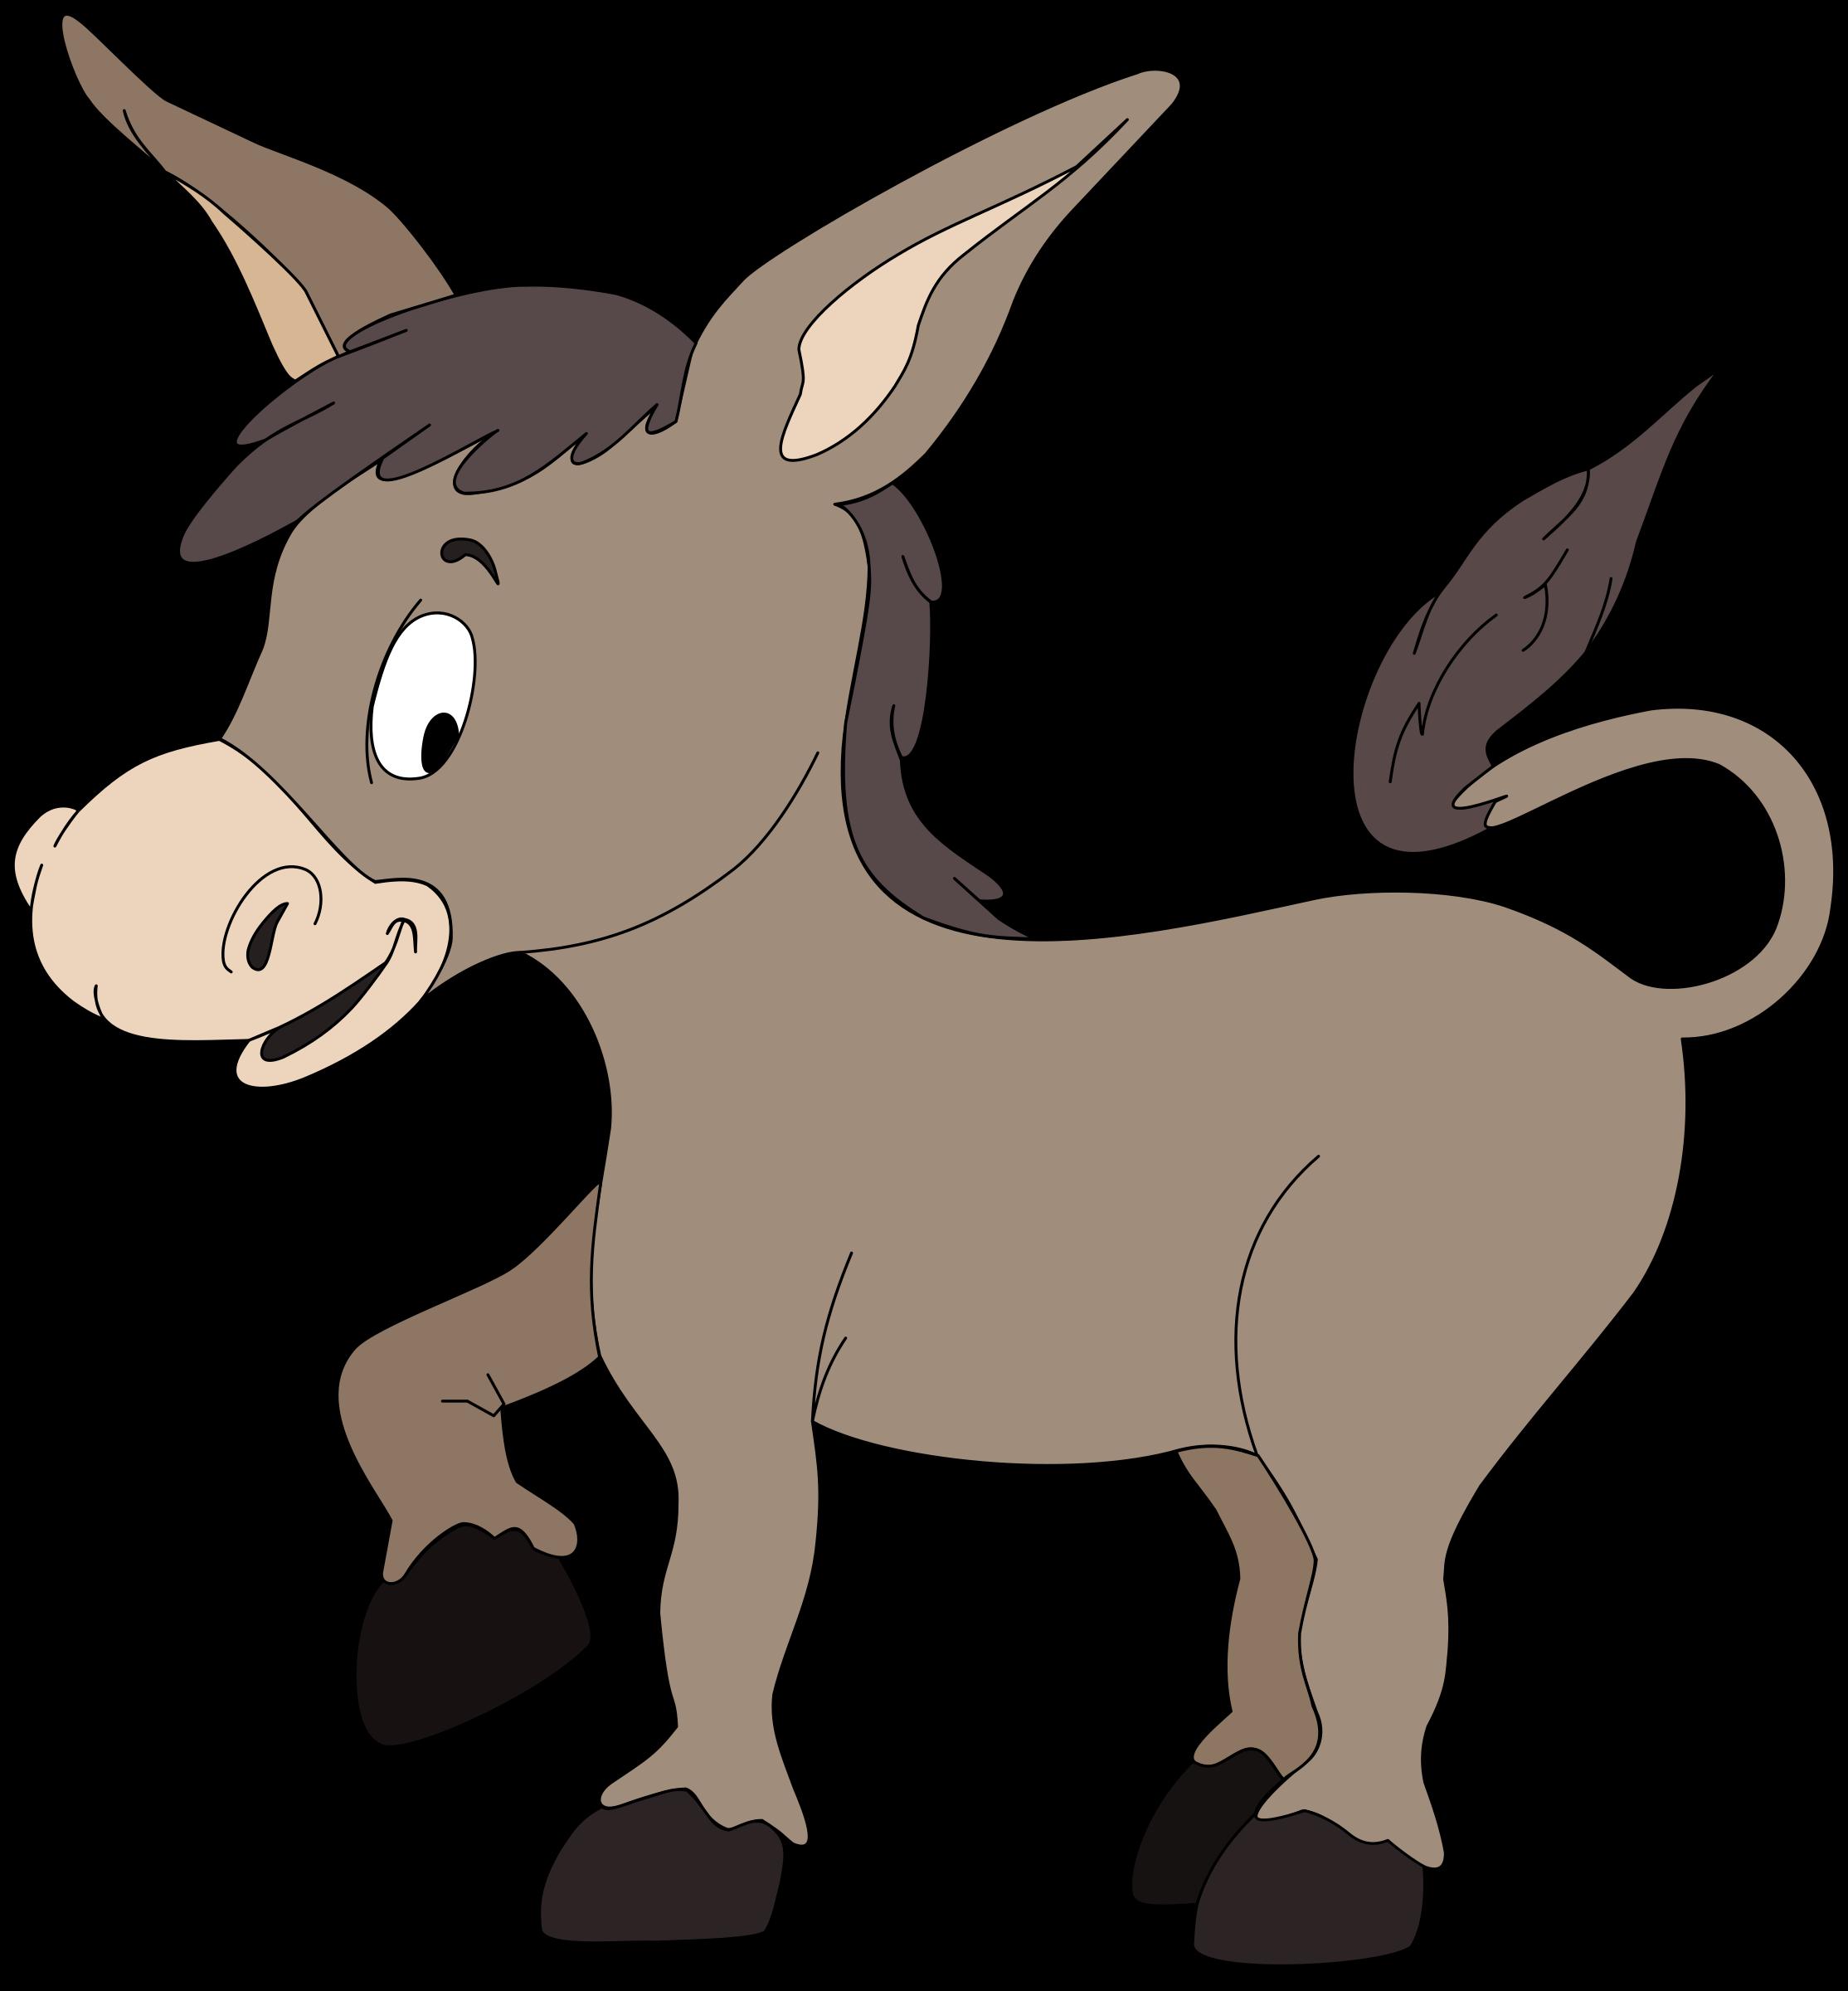 Donkey clip art images illustrations photos